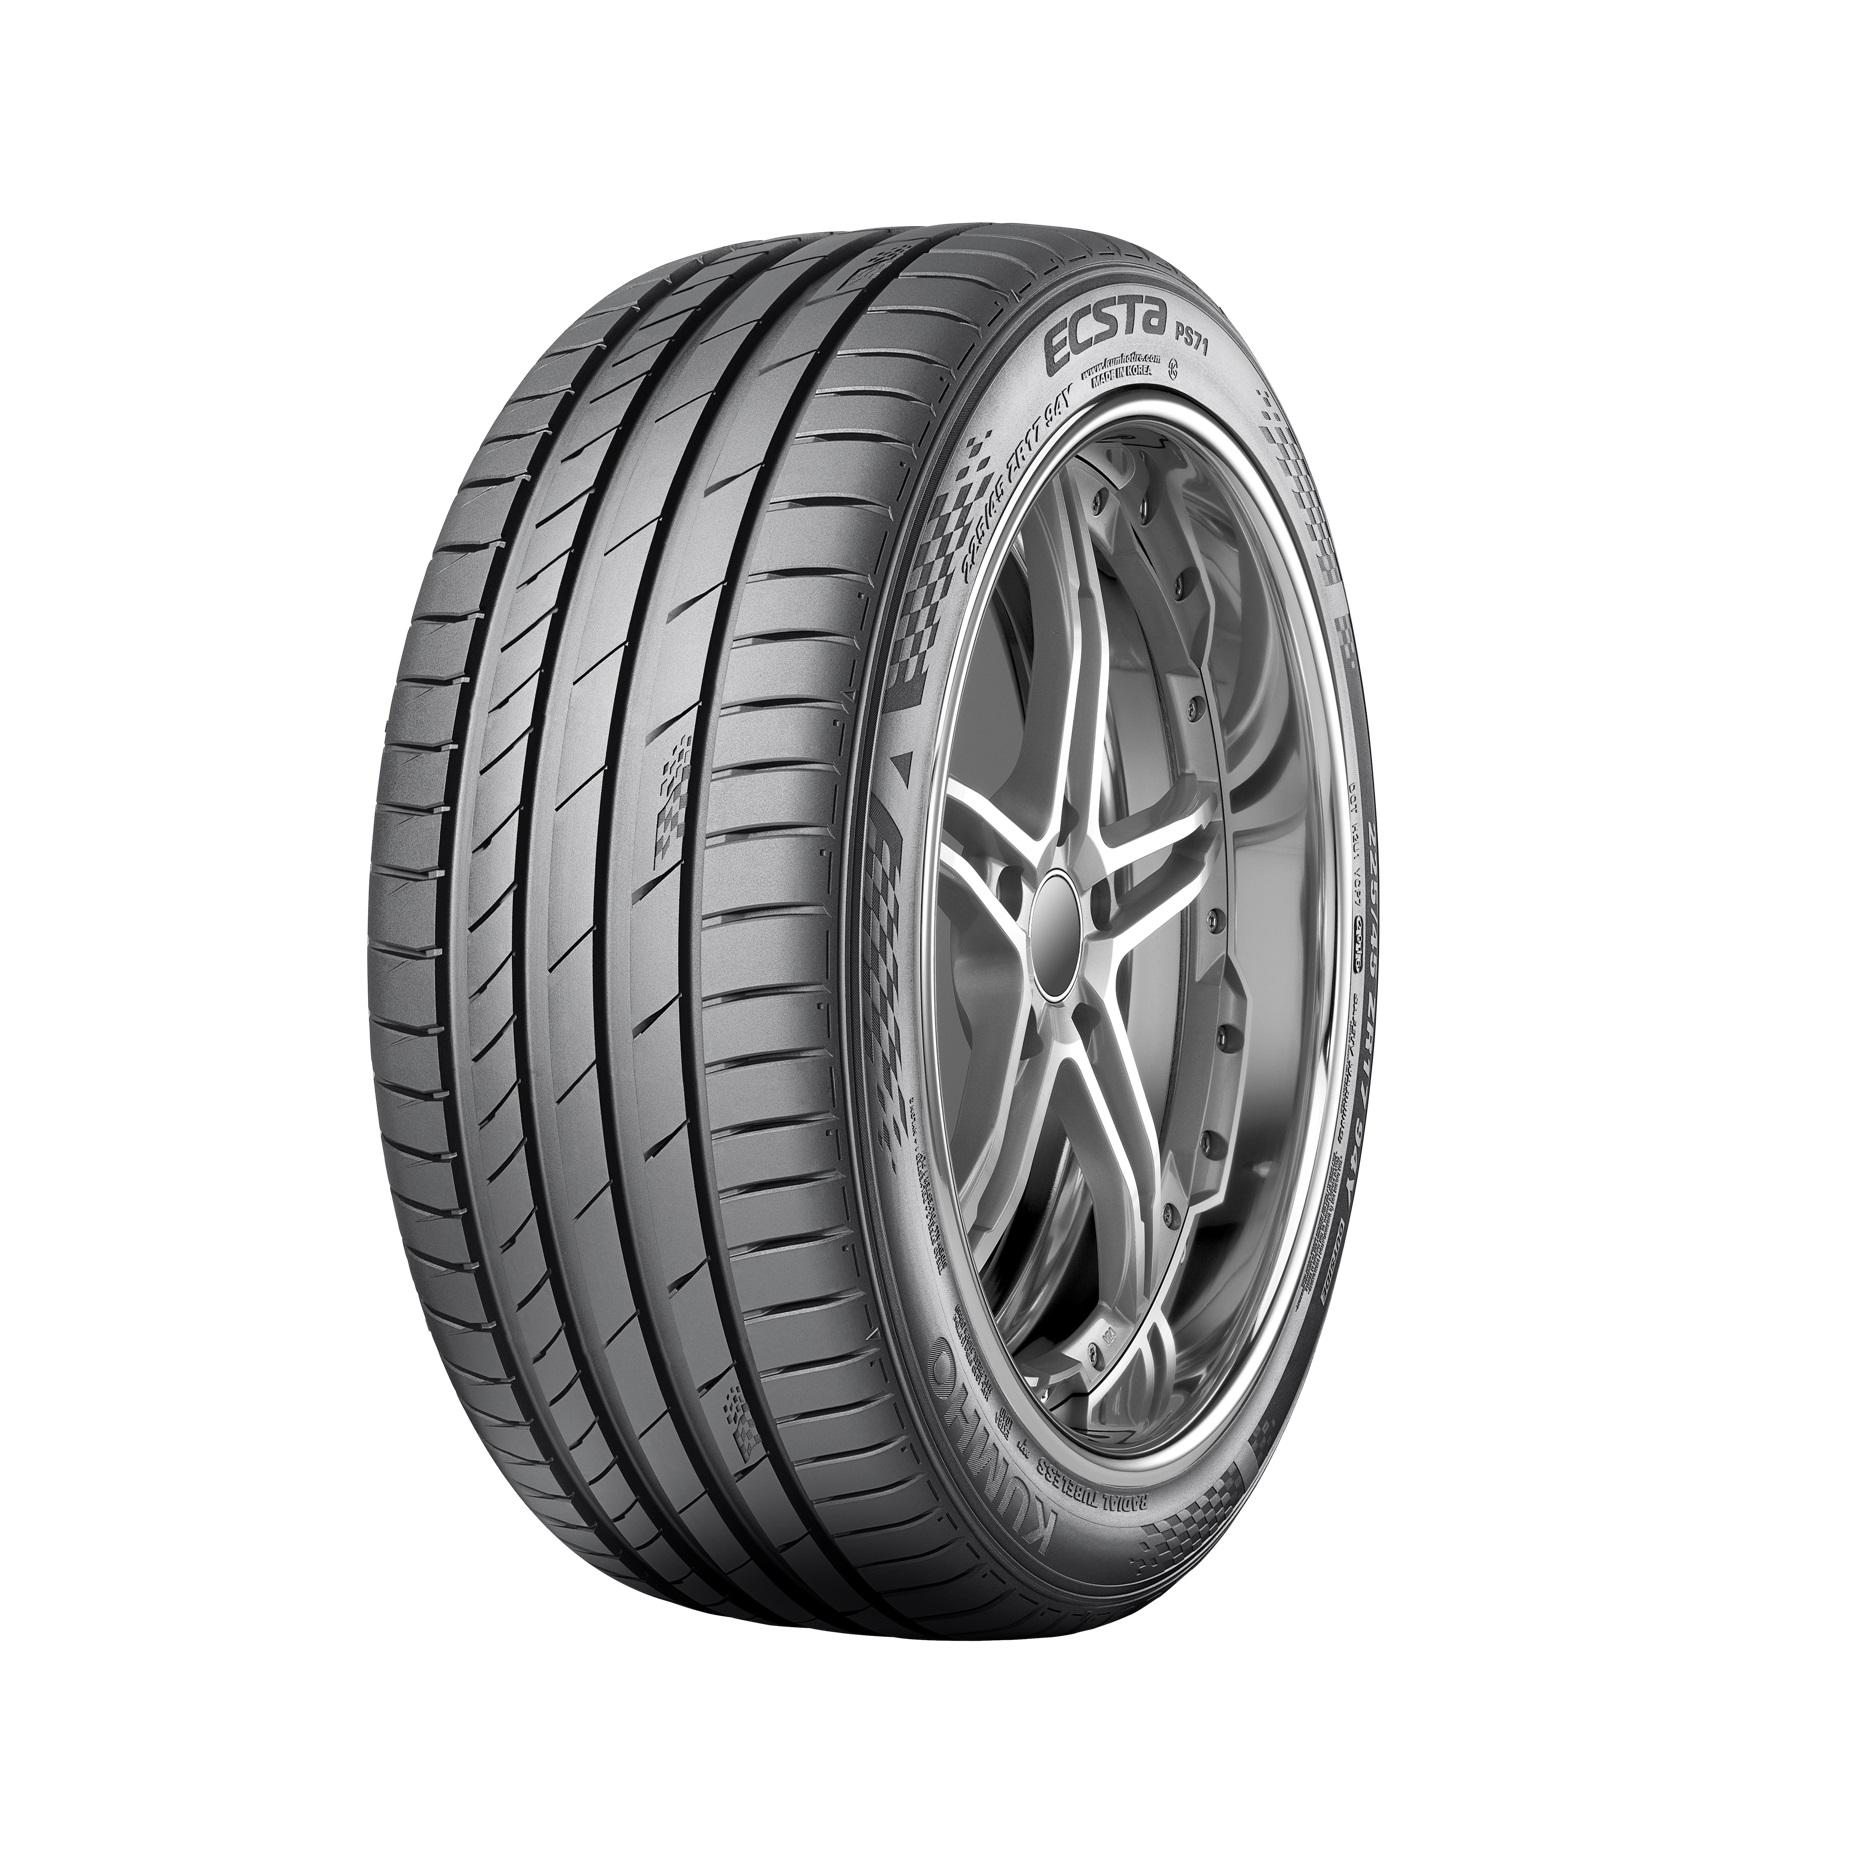 Kumho adds runflat, SUV options to UHP tyre range